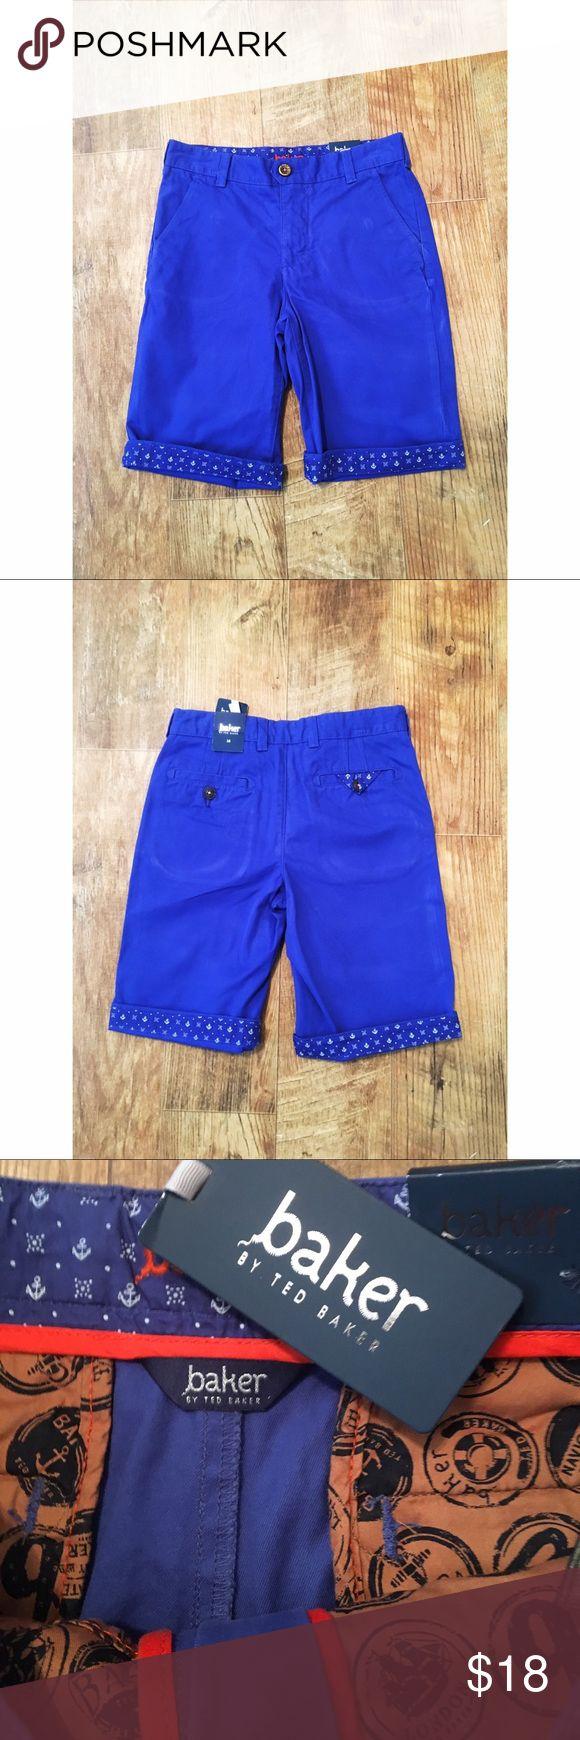 ⚓️ NWT Ted Baker Nautical Shorts ADORABLE • NWT Ted Baker Nautical Shorts ⚓️ Size 12 Baker by Ted Baker Bottoms Shorts